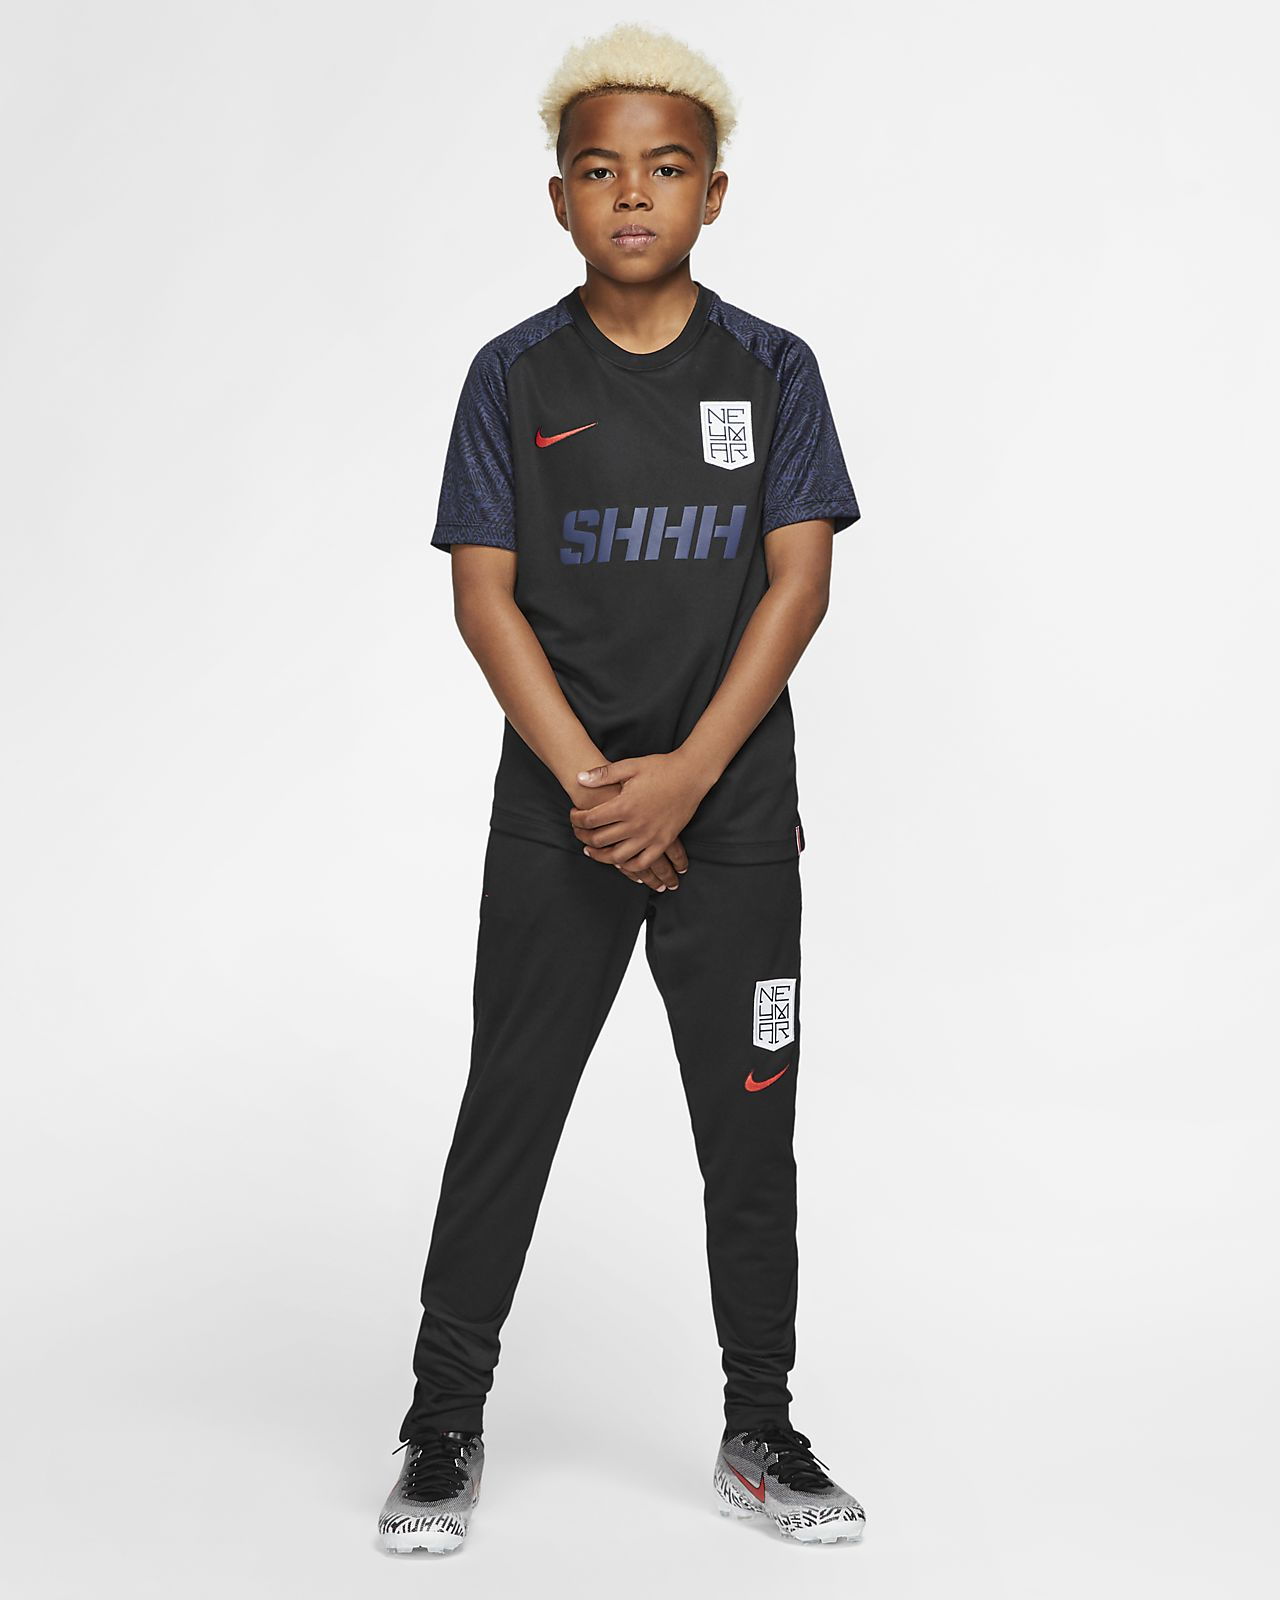 Nike Dri FIT Neymar Jr. Older Kids' Short Sleeve Football Top